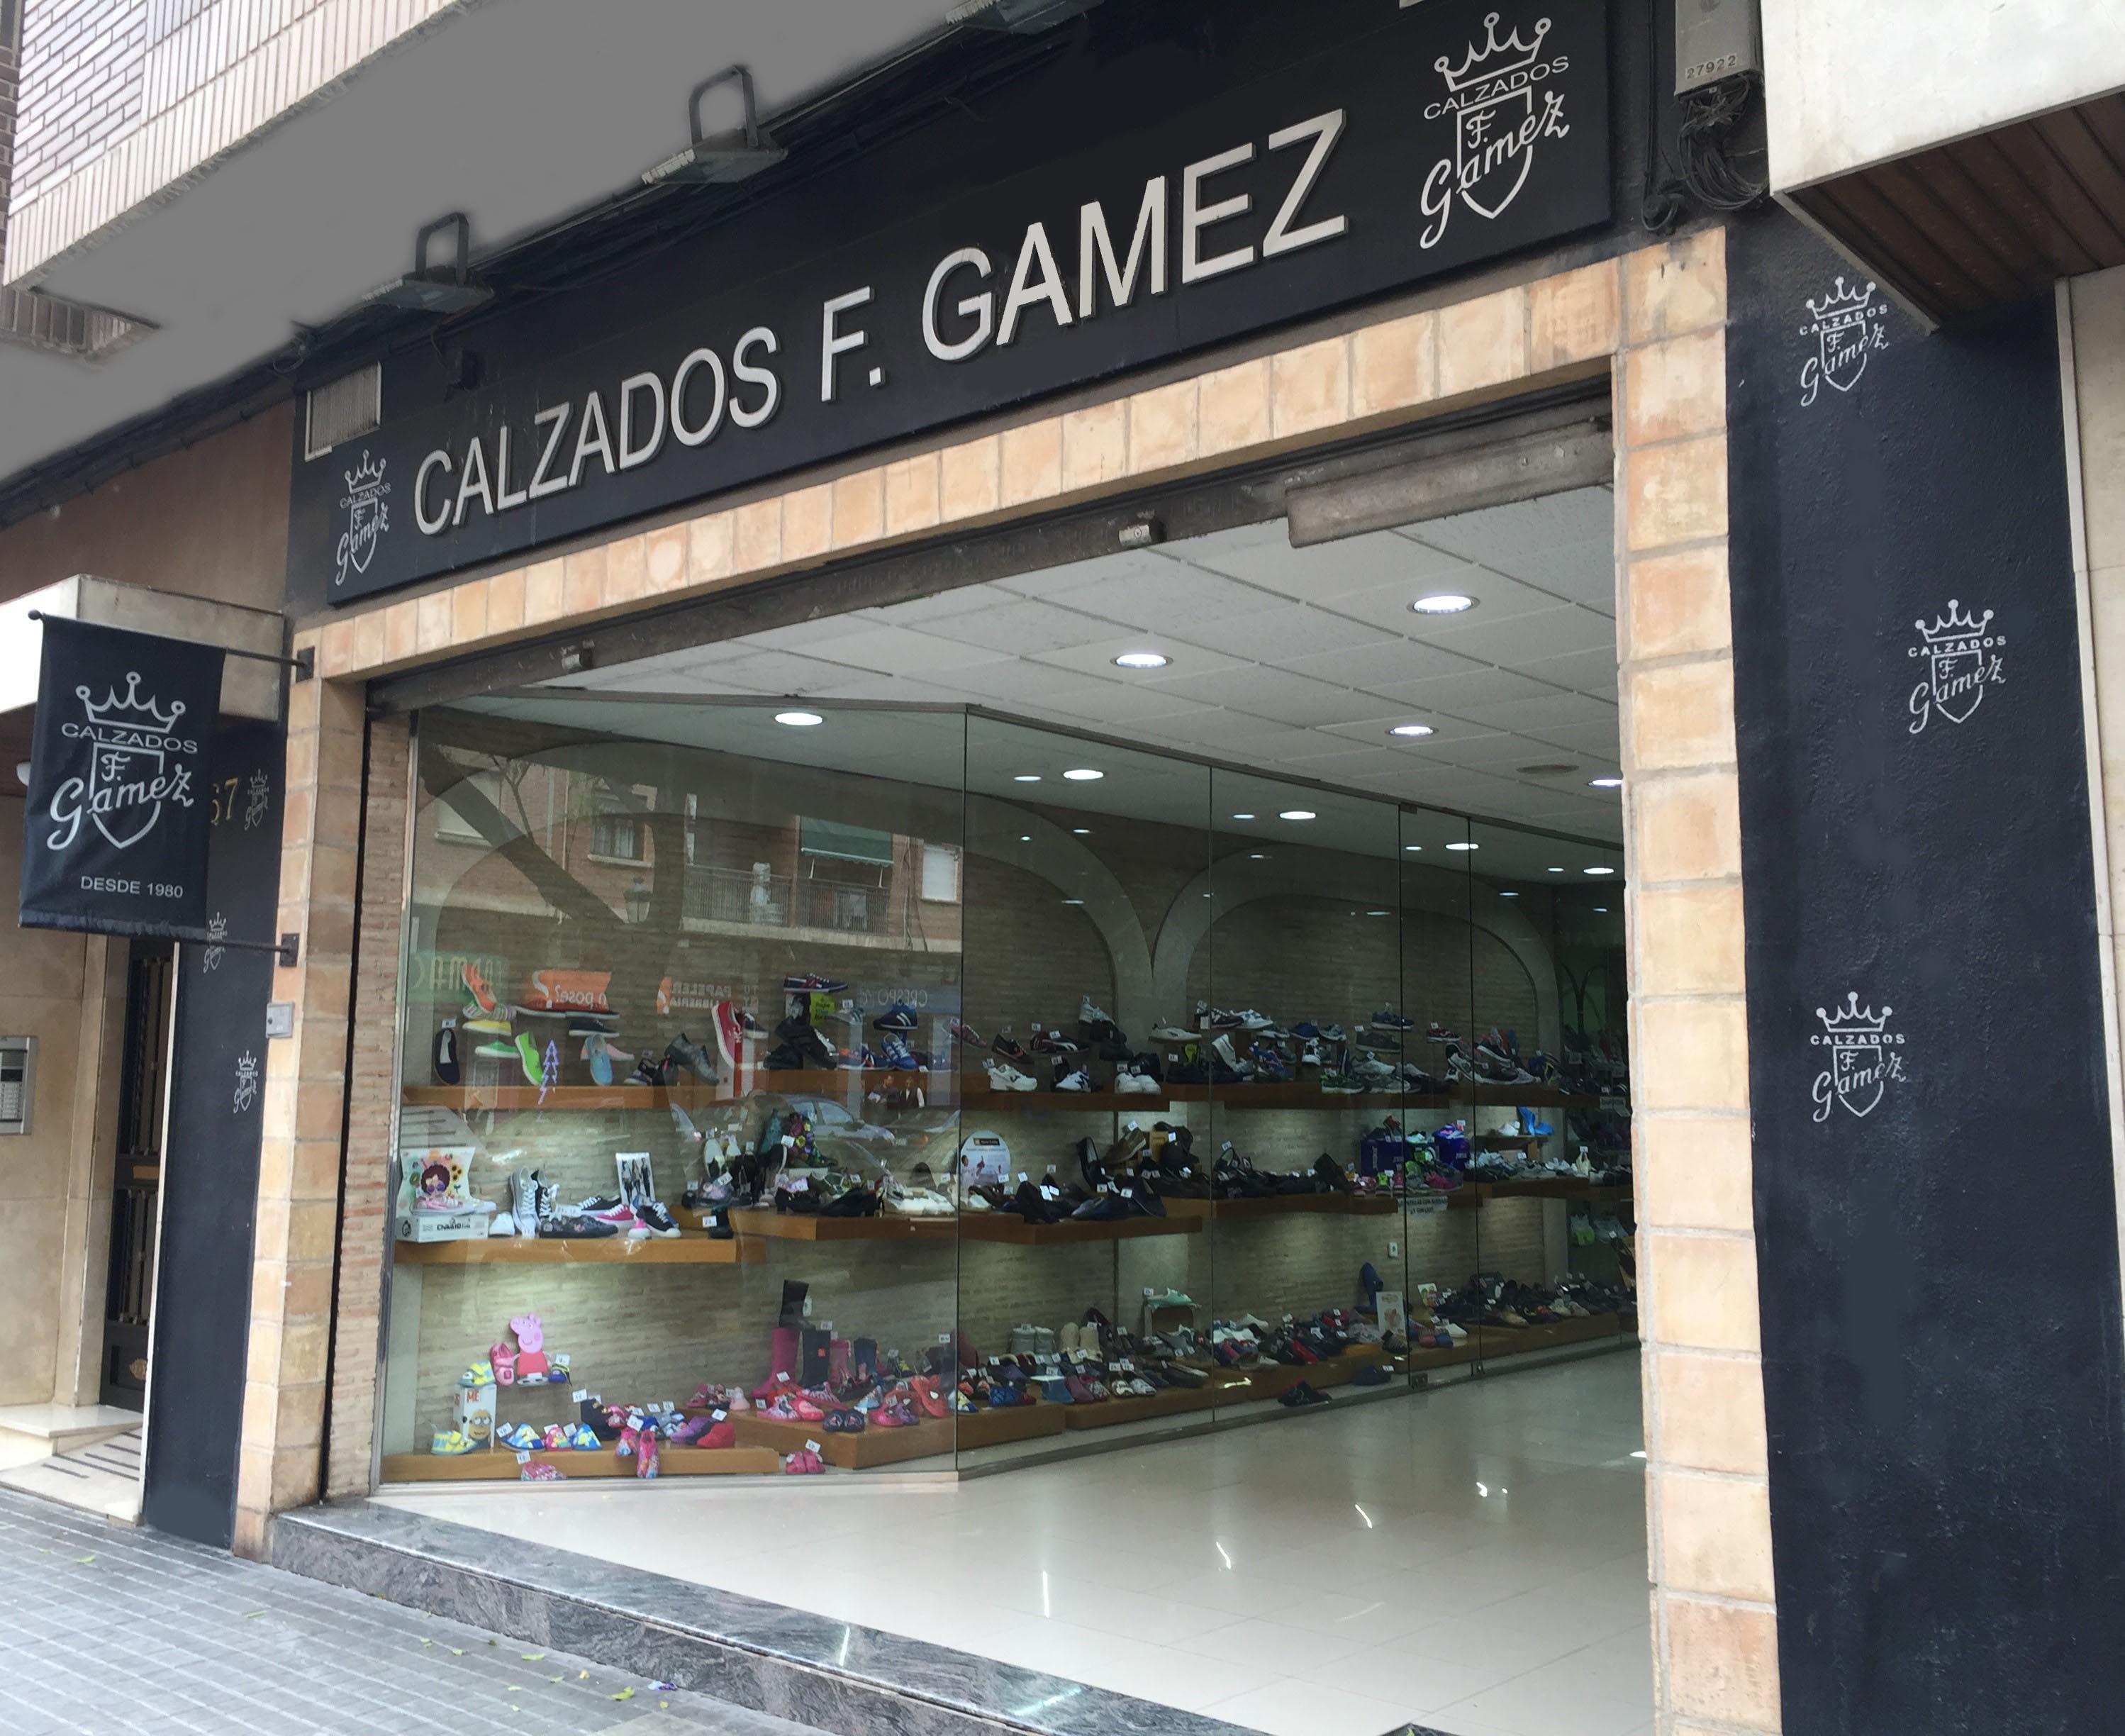 Calzados F.Gamez